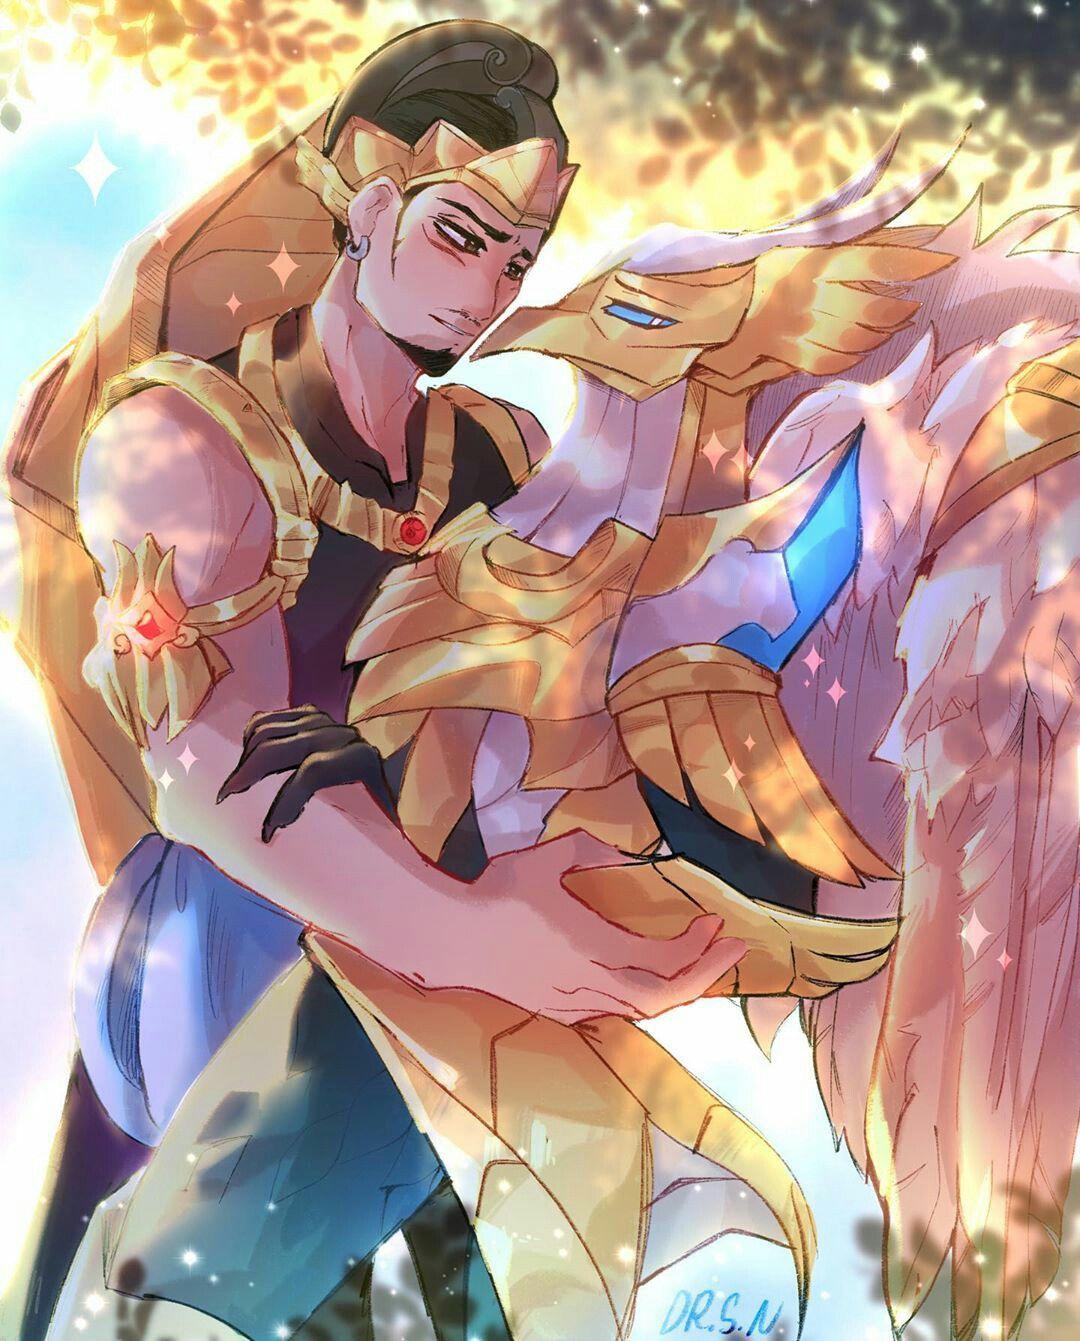 Gotakaca And Kaja Mlbb Mobile Legends Mobile Legends Anime Legend